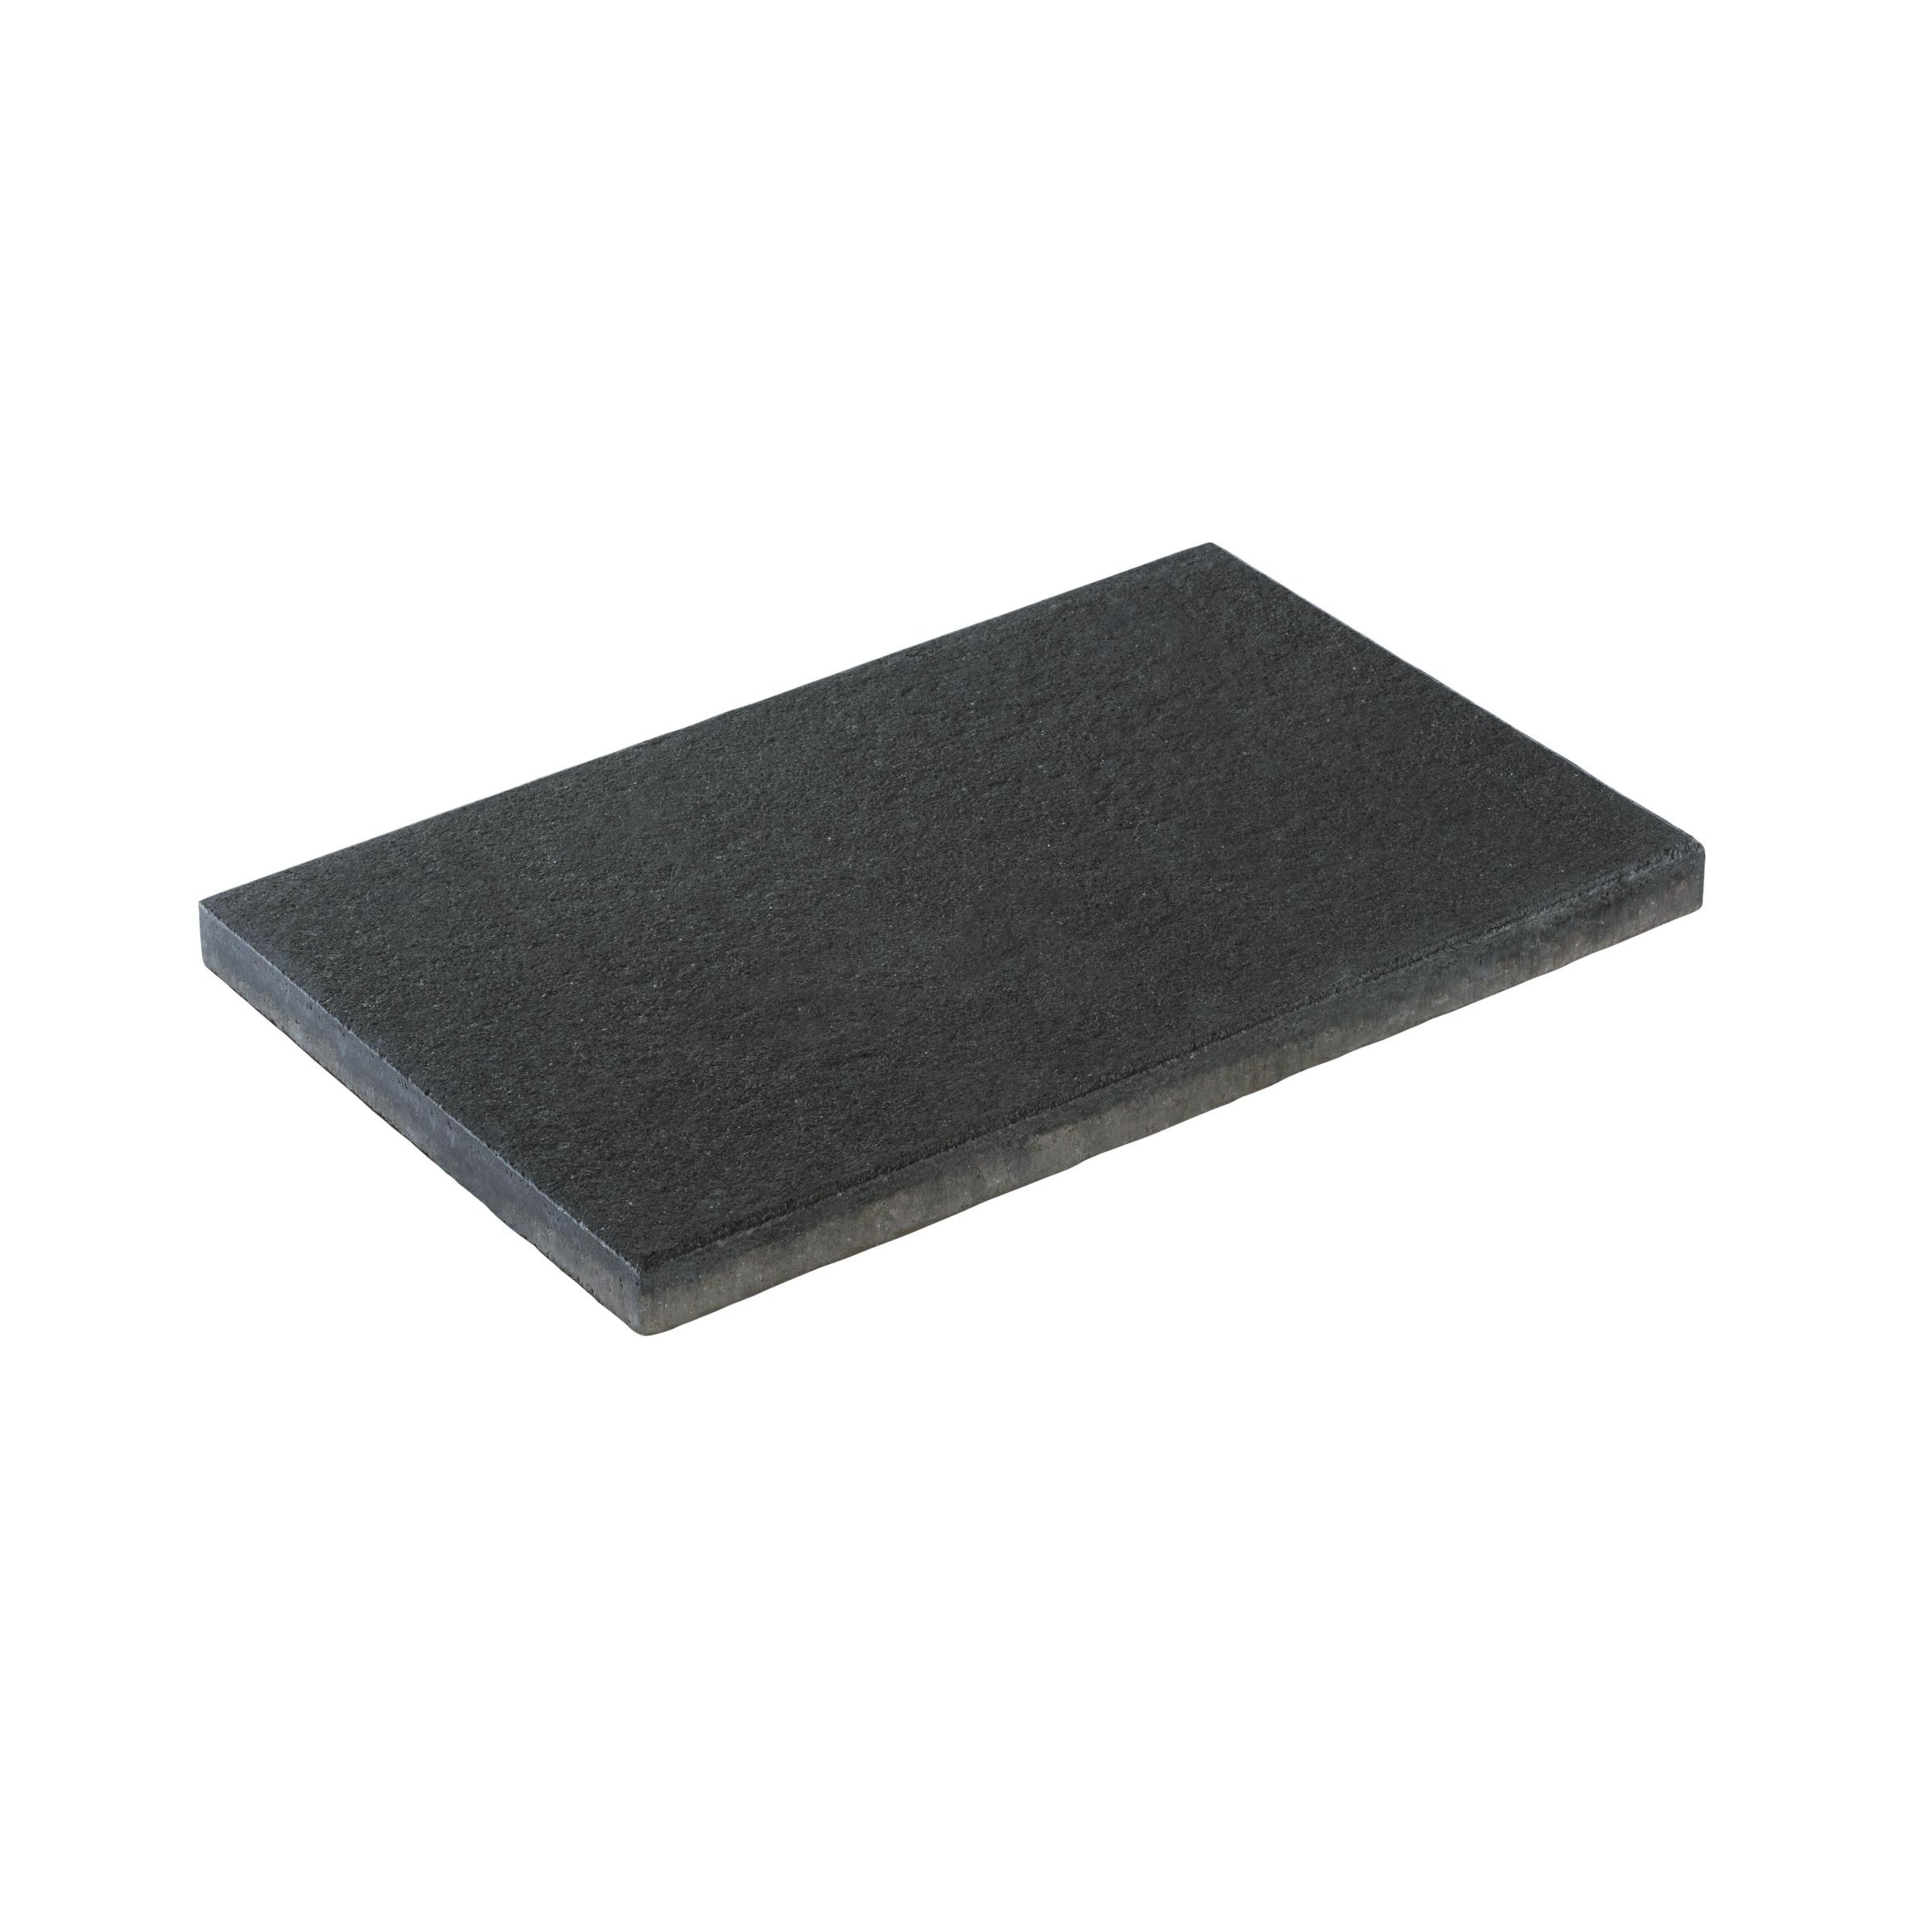 Terrastegel Beton Stuco Basalt Zwart 60x40 cm - Per Tegel - 0,24 m2